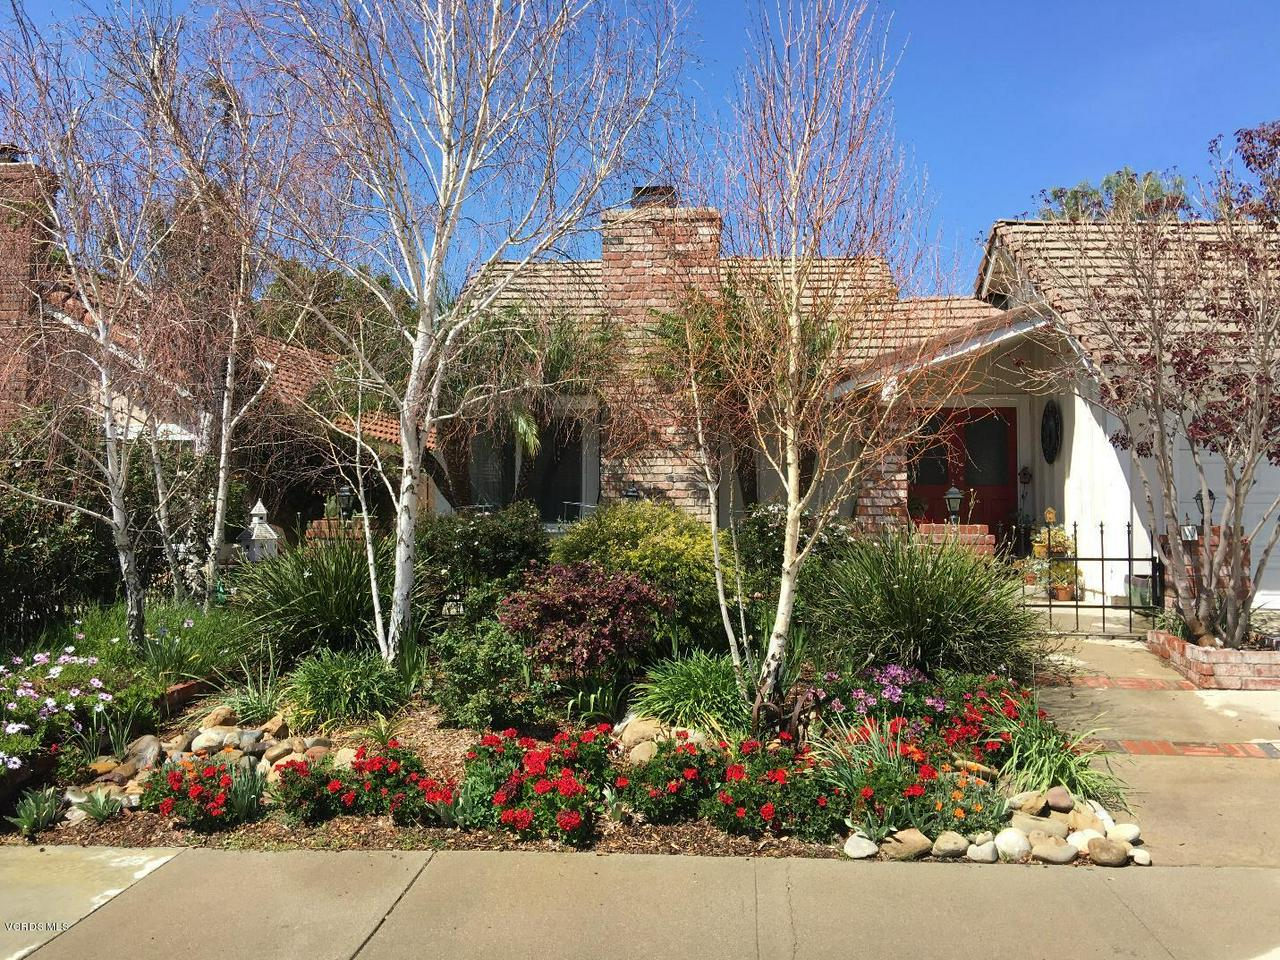 Photo of 2849 SHELTER WOOD COURT, Thousand Oaks, CA 91362